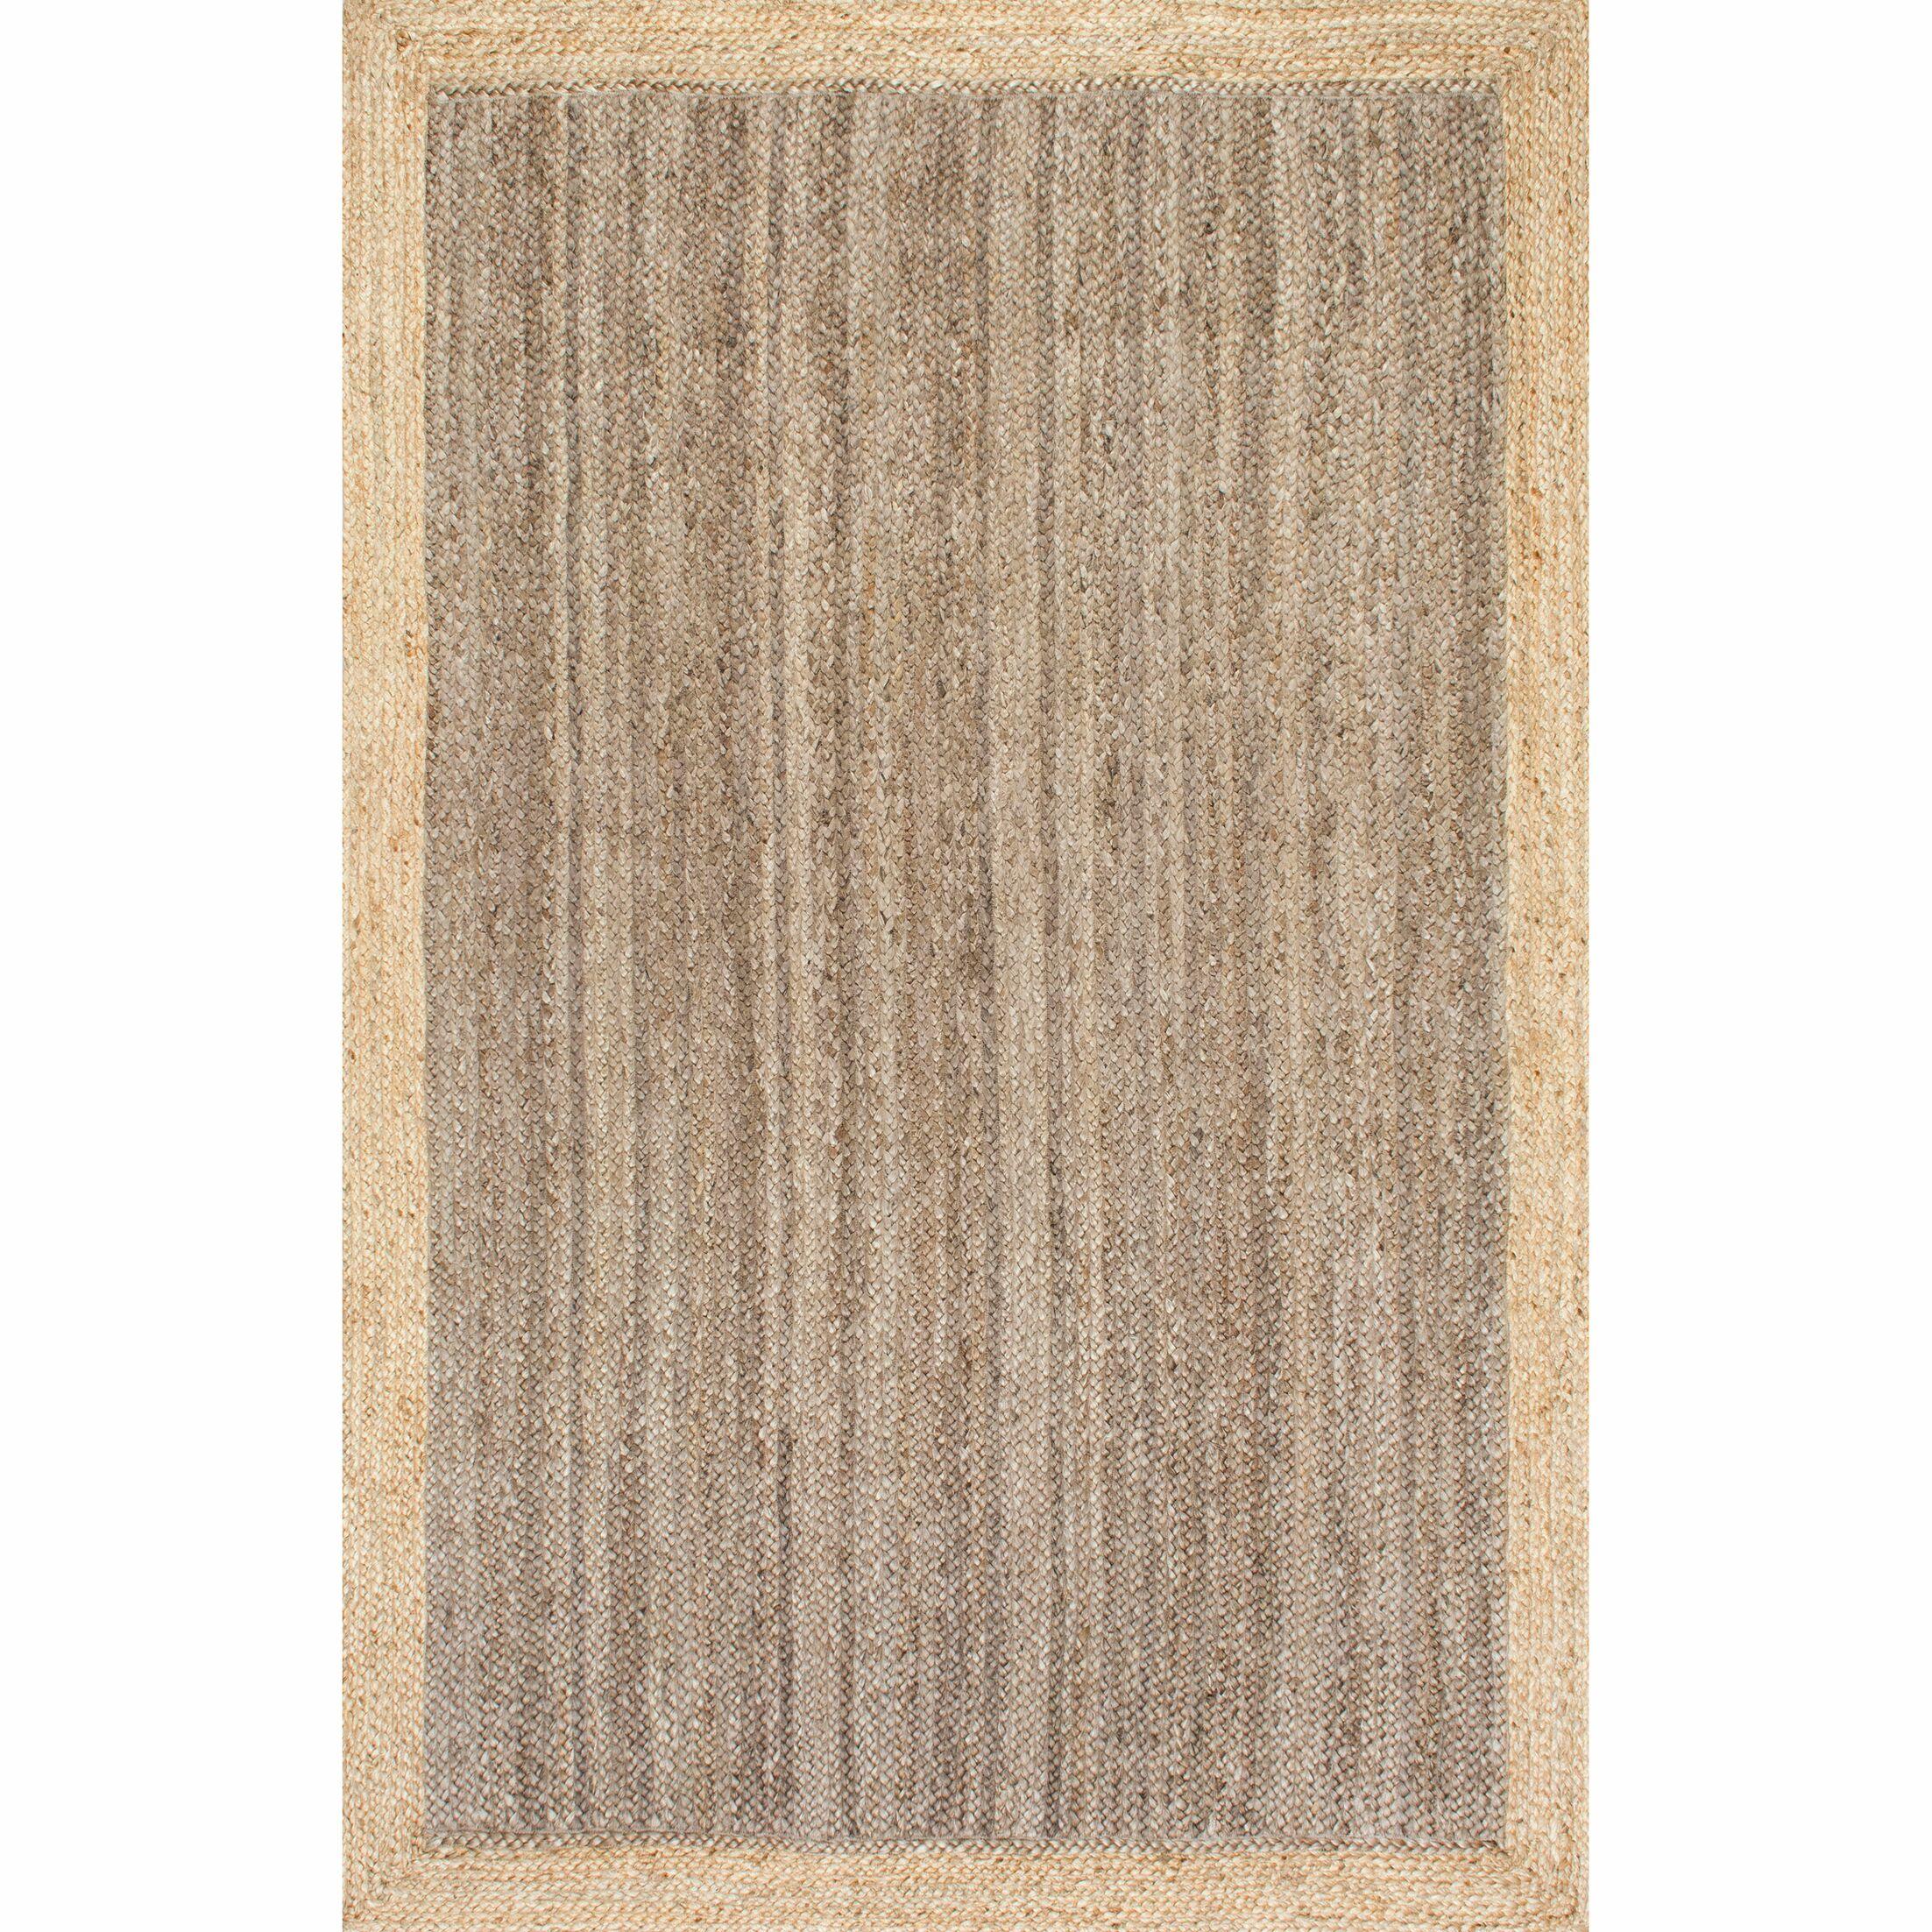 Benham Gray Area Rug Rug Size: Rectangle 9' x 12'